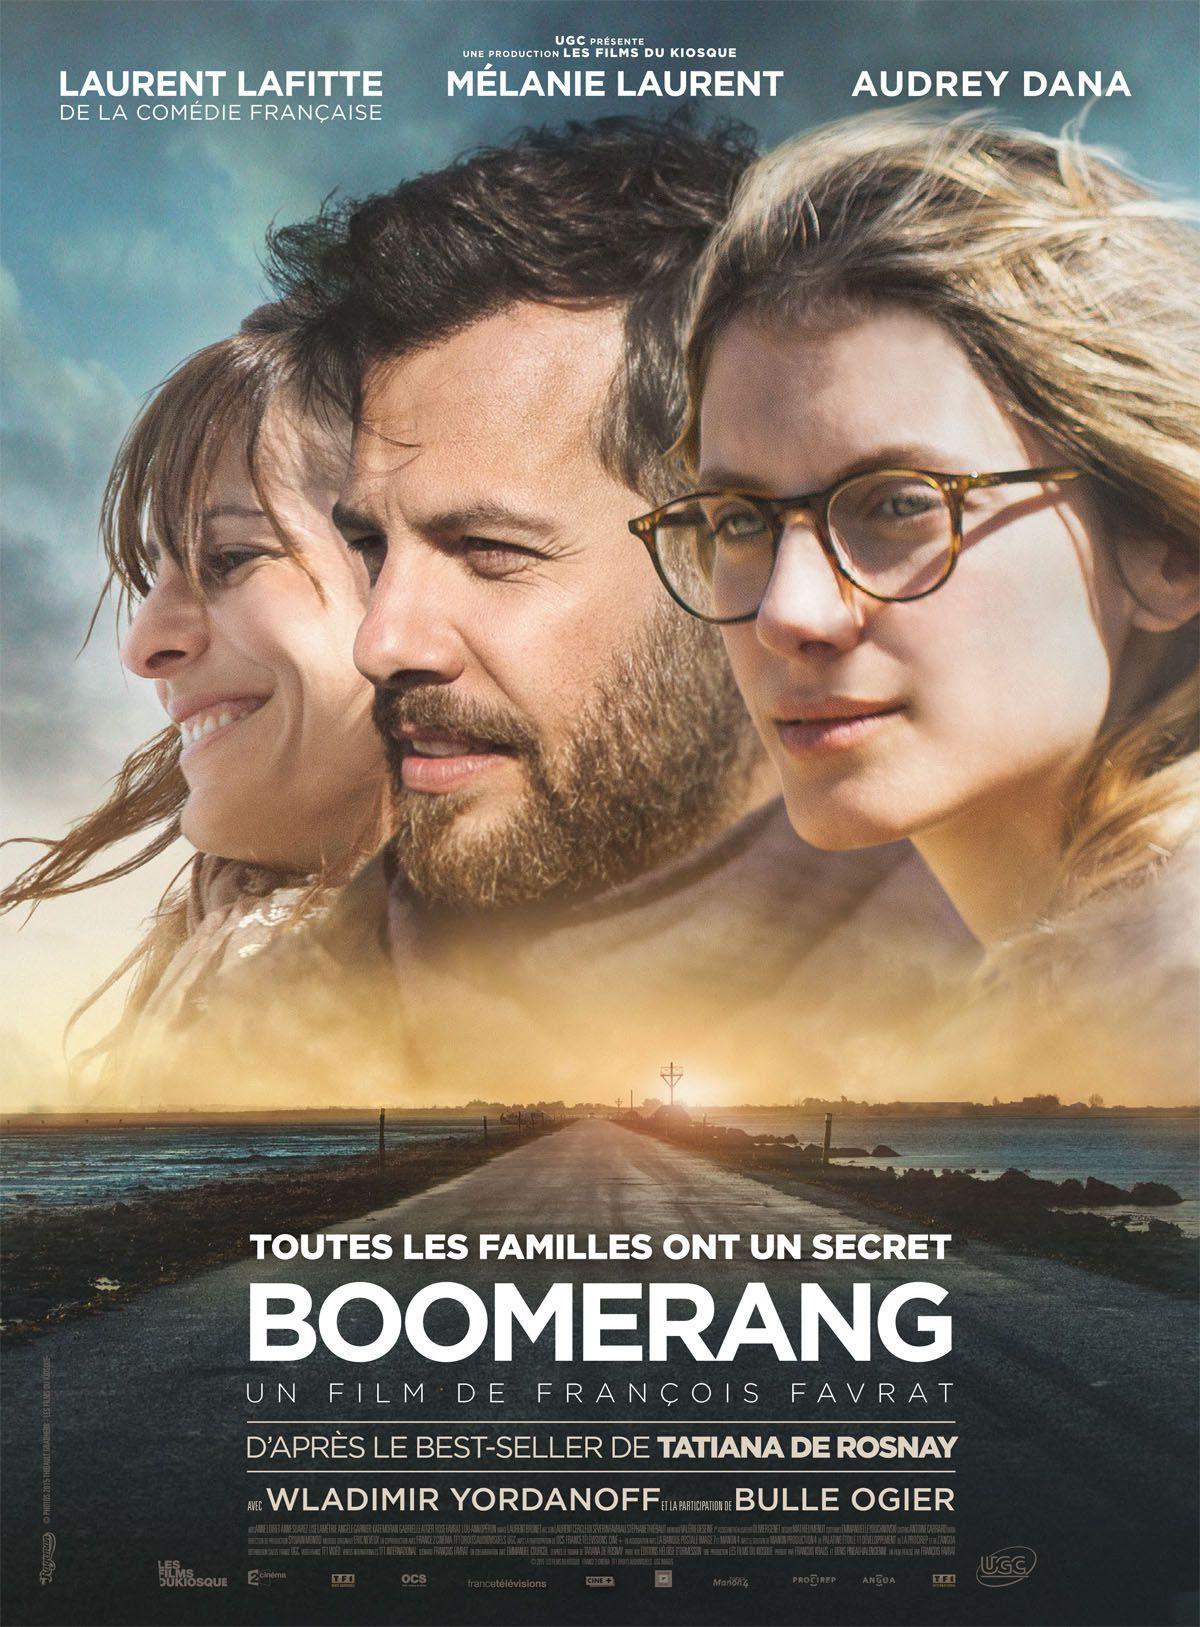 Boomerang - Film (2015)